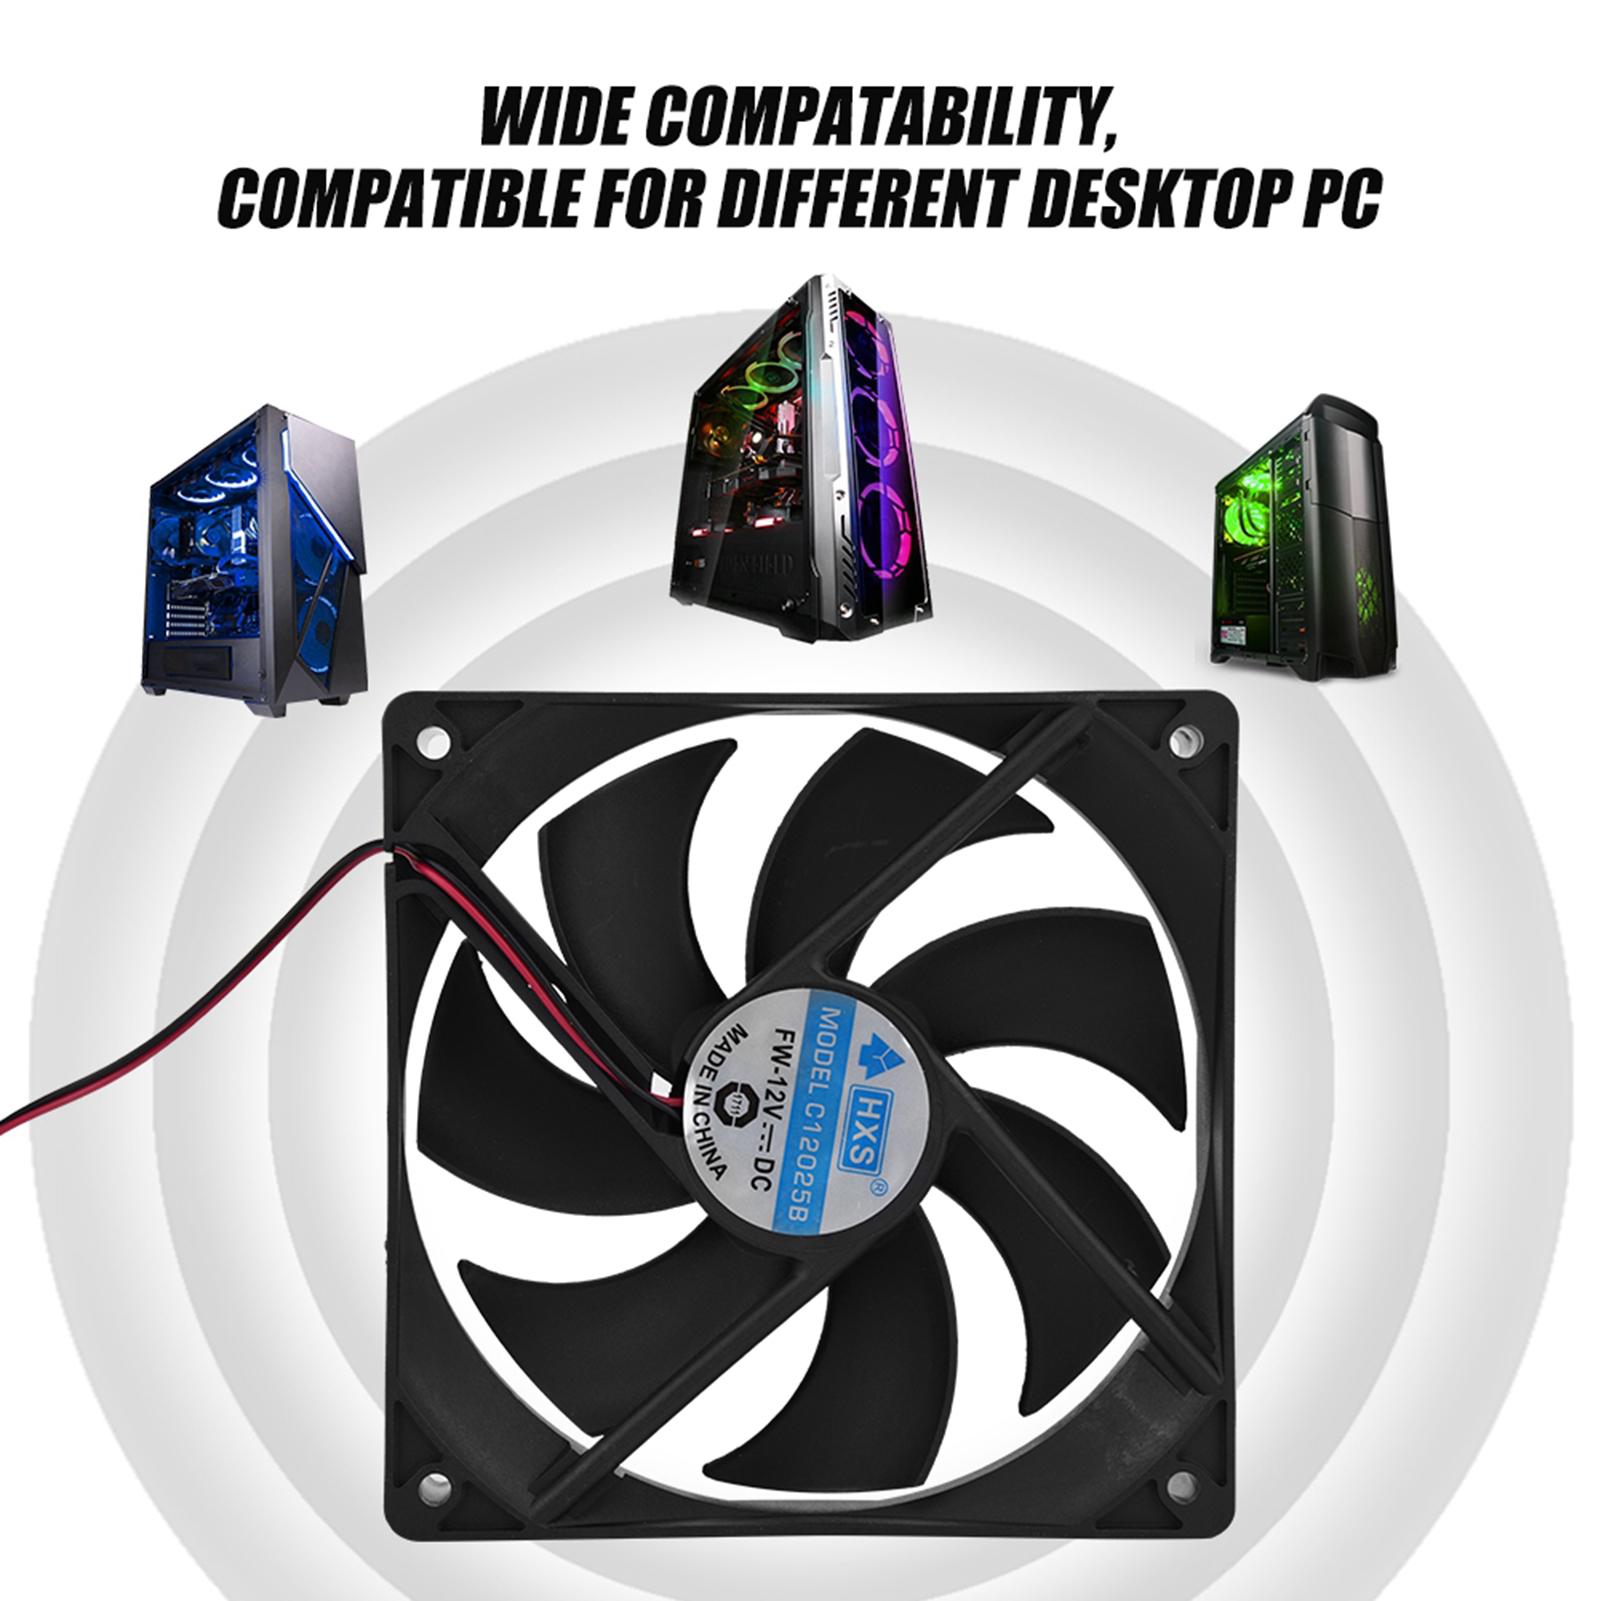 2x DC 12V 120mm Silent PC Computer Case CPU Cooling Fan Cooler Radiator Heatsink